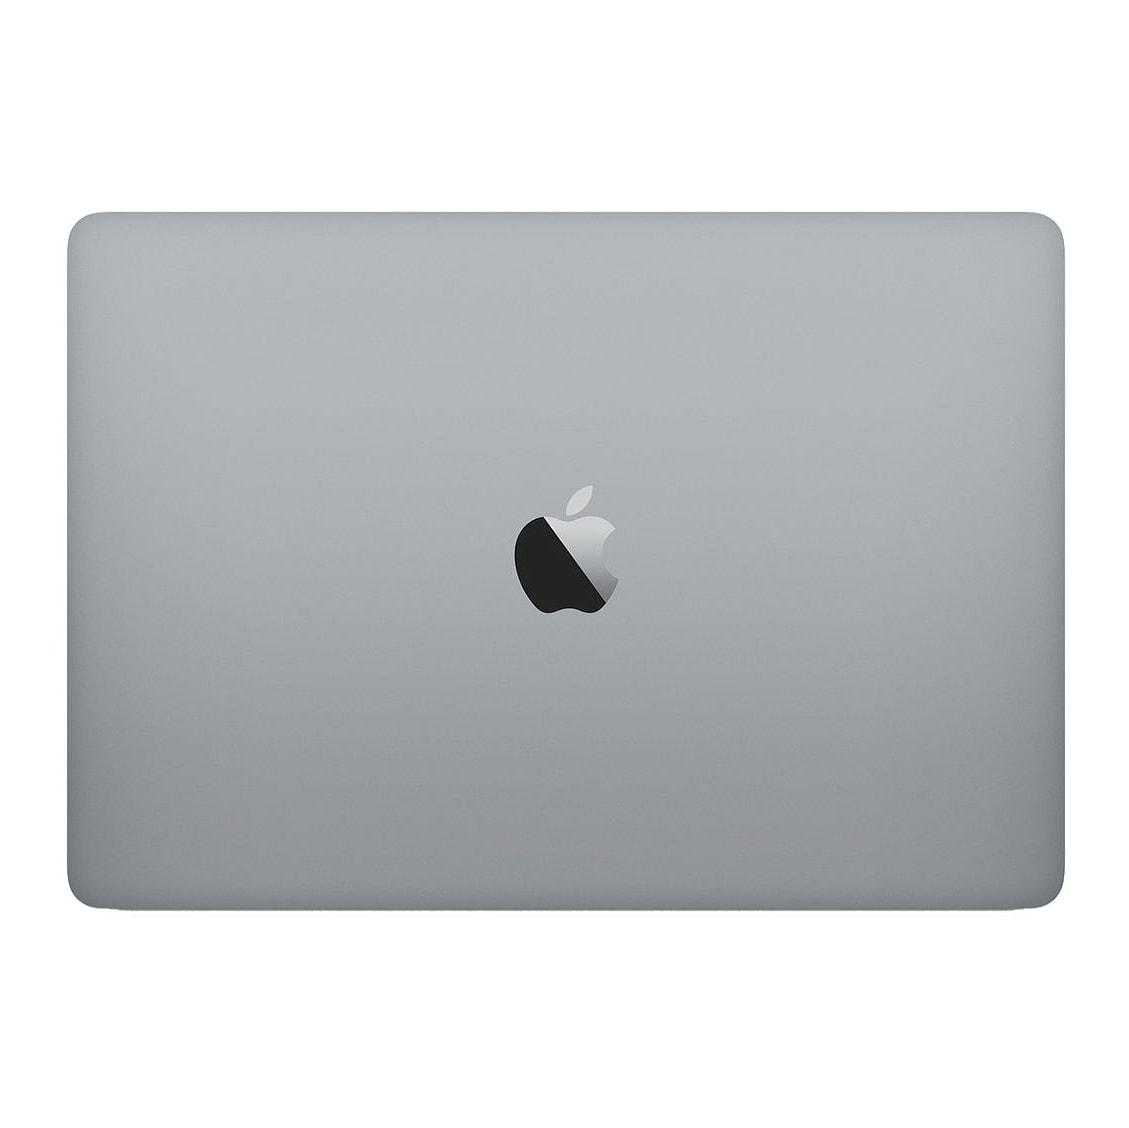 "Retina Apple Macbook Pro 13.3"" Touchbar A2159 2019 Powerful Core i5 256GB SSD 8GB RAM Mac Laptop OS Big Sur Silver"